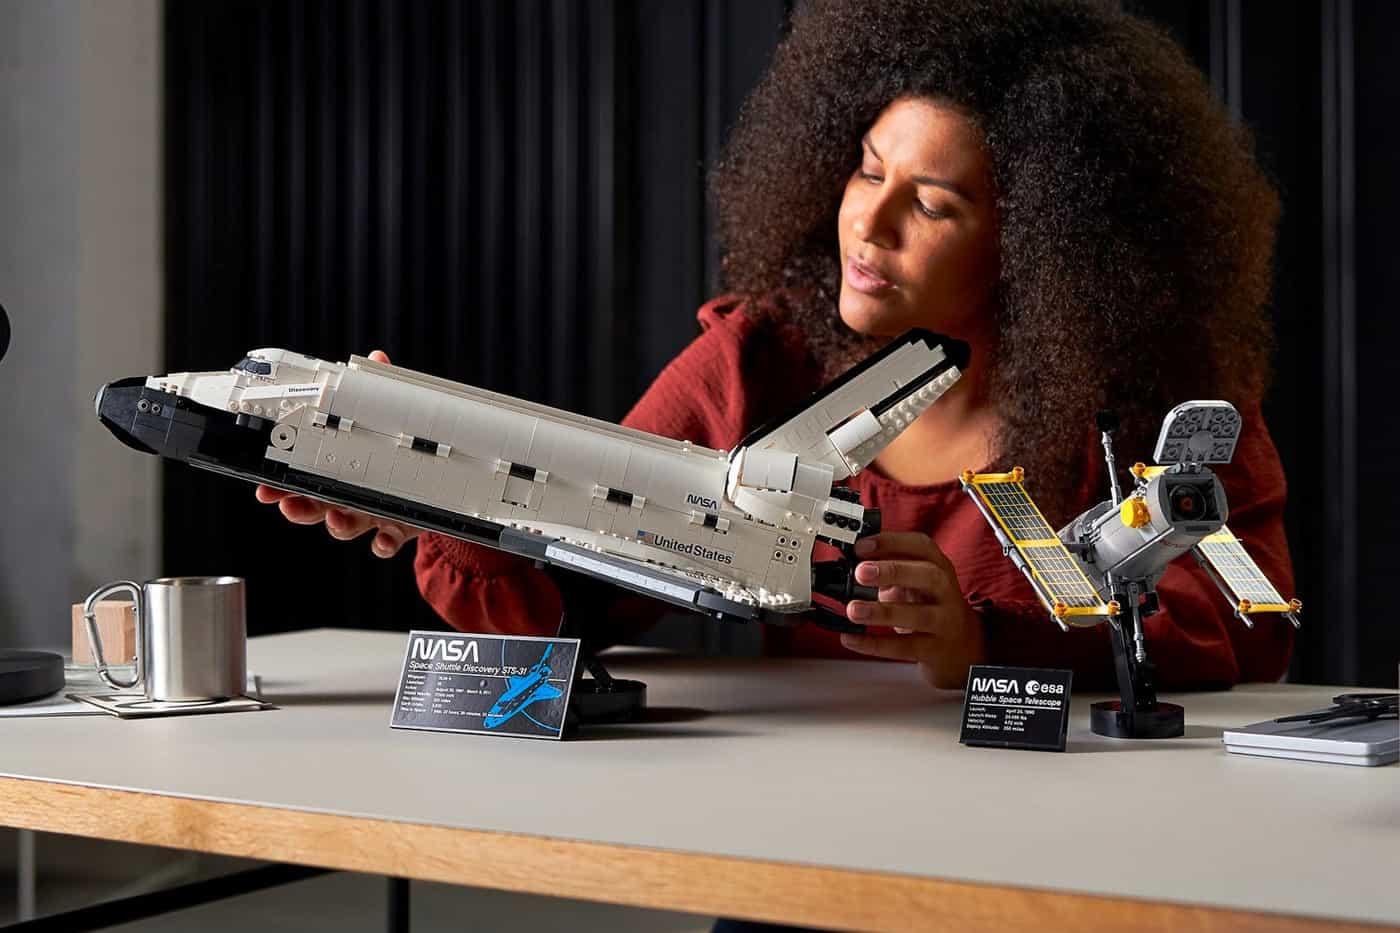 LEGO x NASA